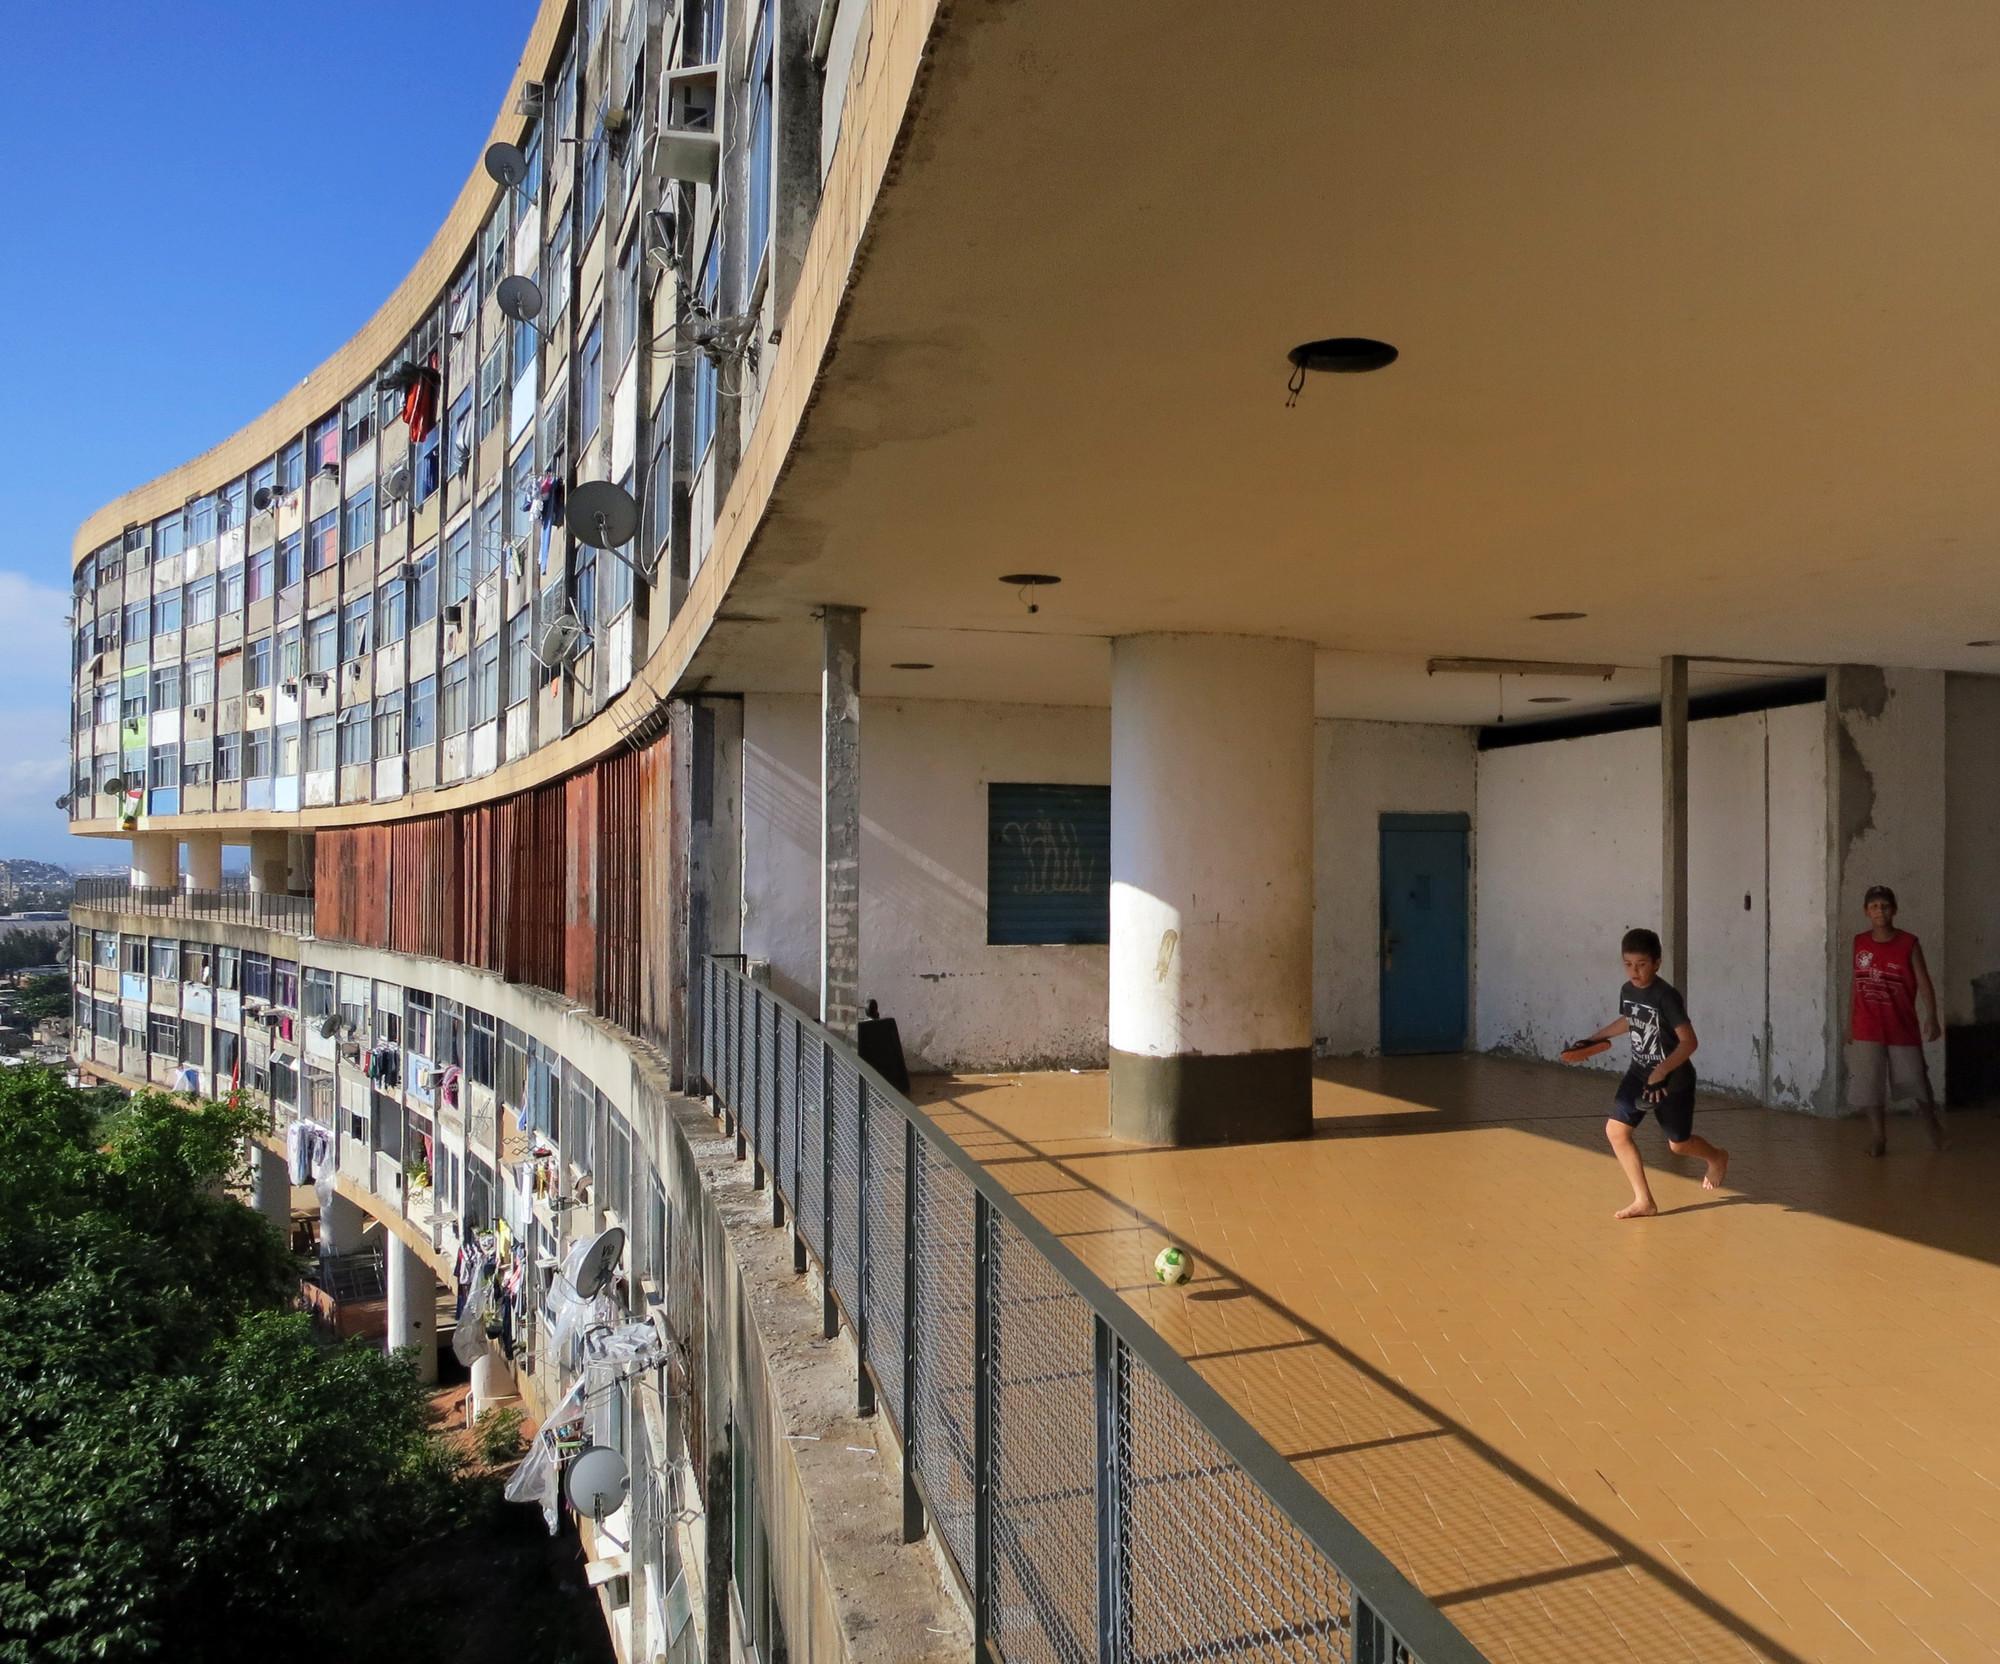 Affonso Eduardo Reidy, Pedregulho Housing (1950-52). Image © John Hartmann